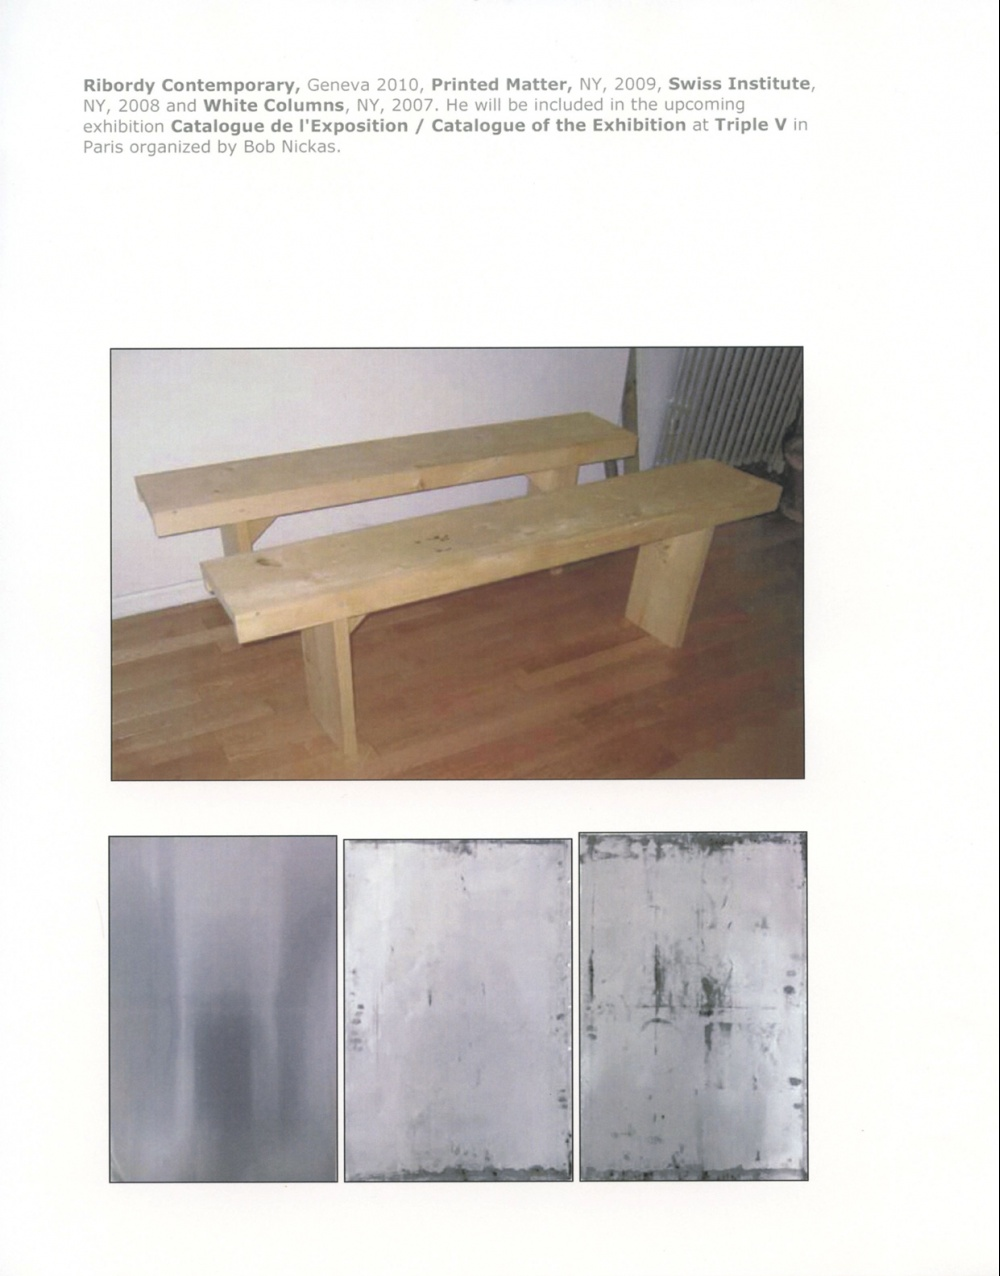 AMA1106.1, page 3